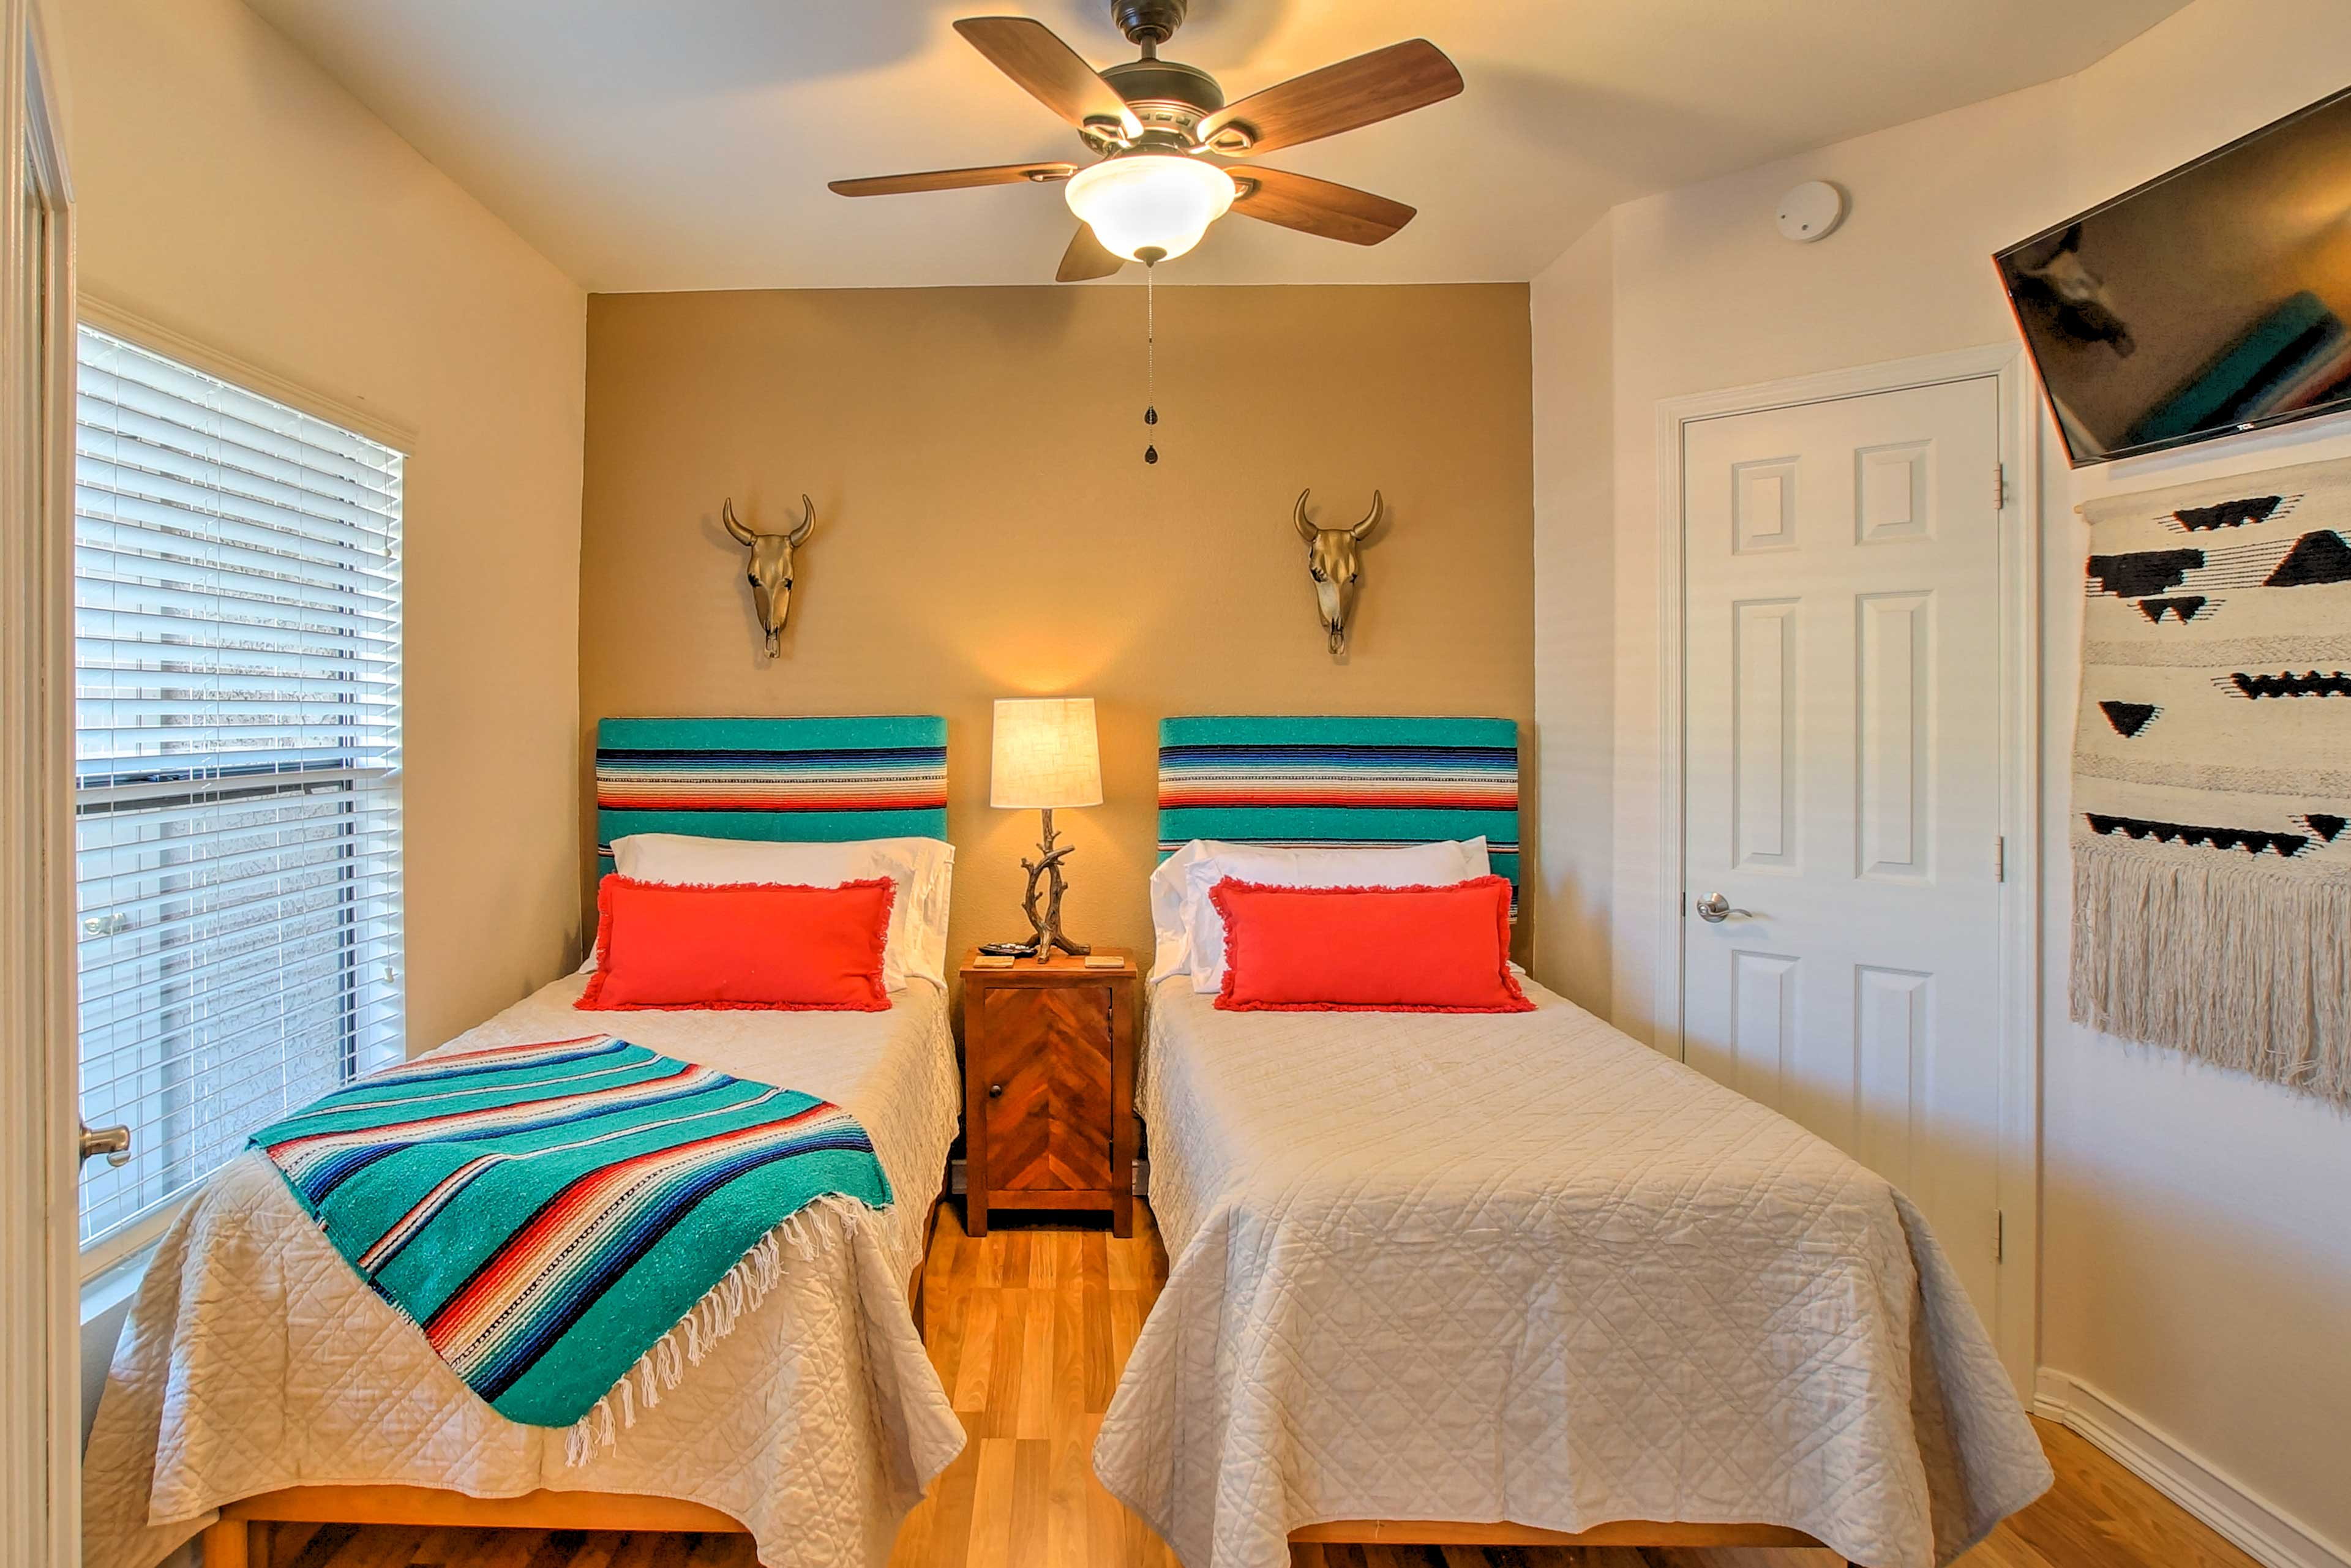 The guest bedroom includes 2 twin Tempur-Pedic mattresses.